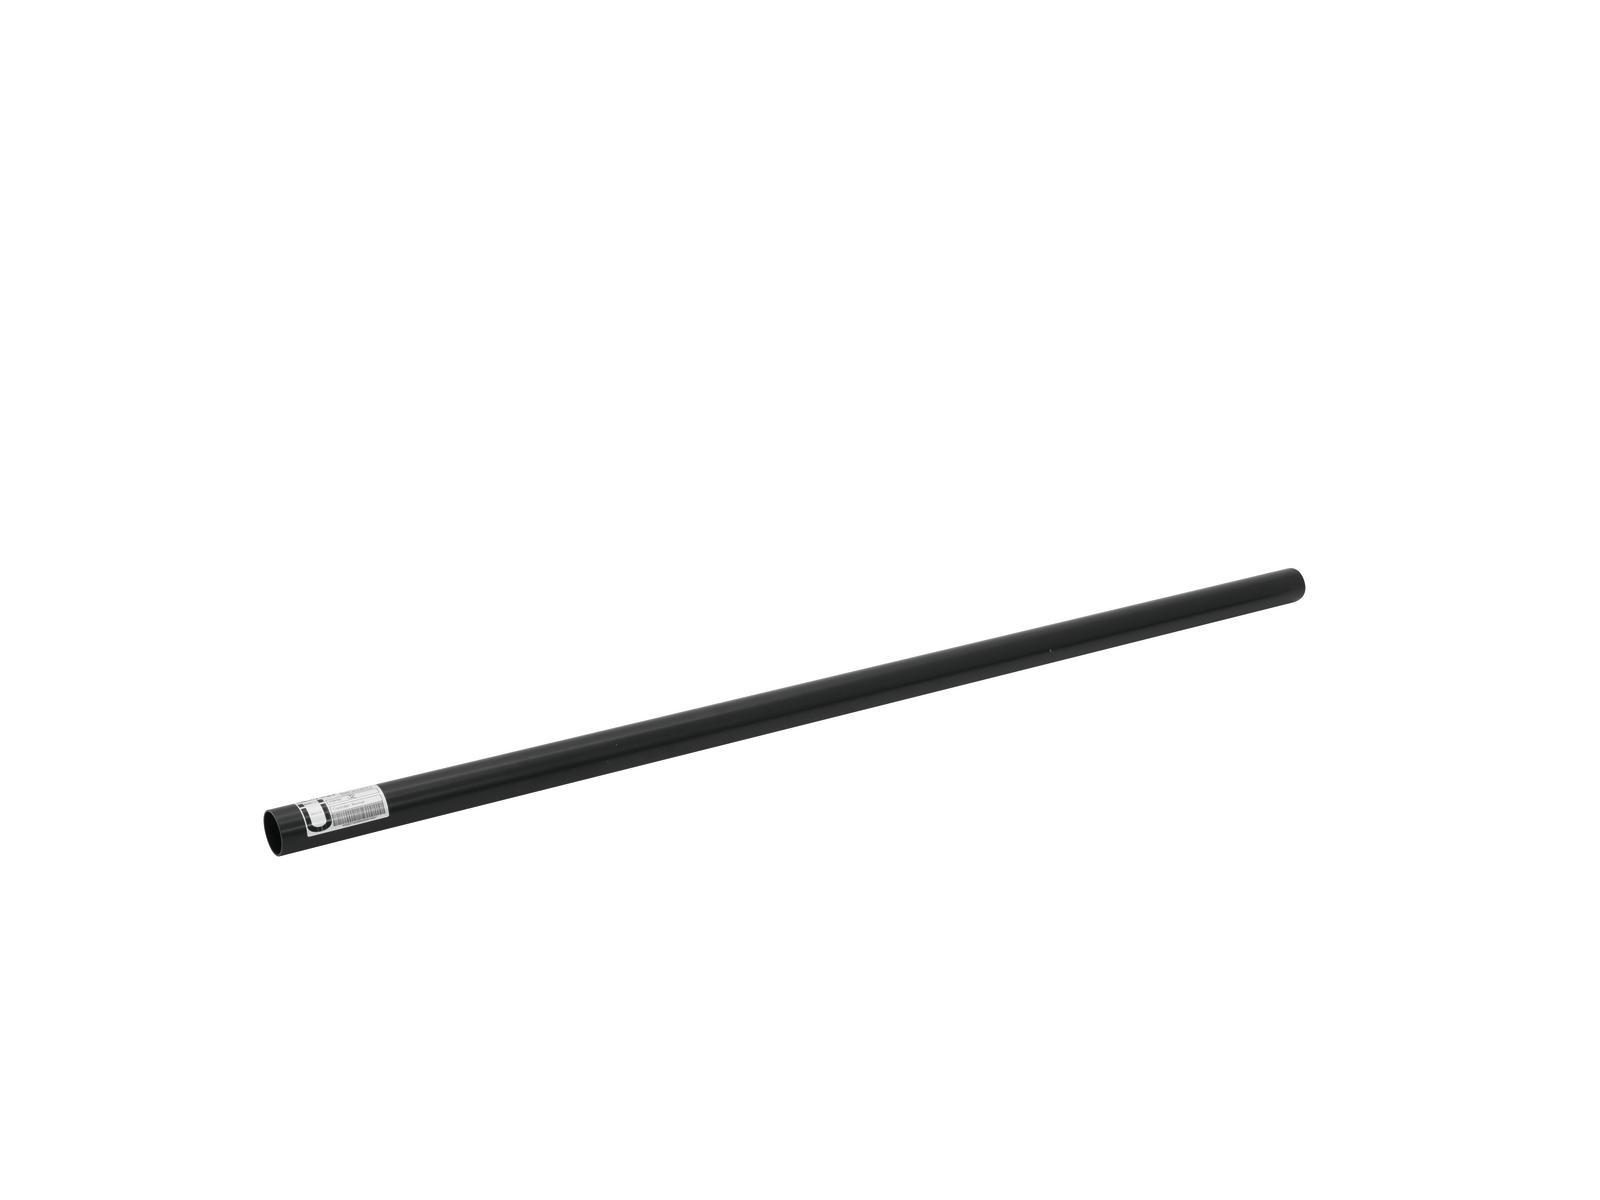 ALUTRUSS Alurohr 6082 50x2mm 1,5m schwarz